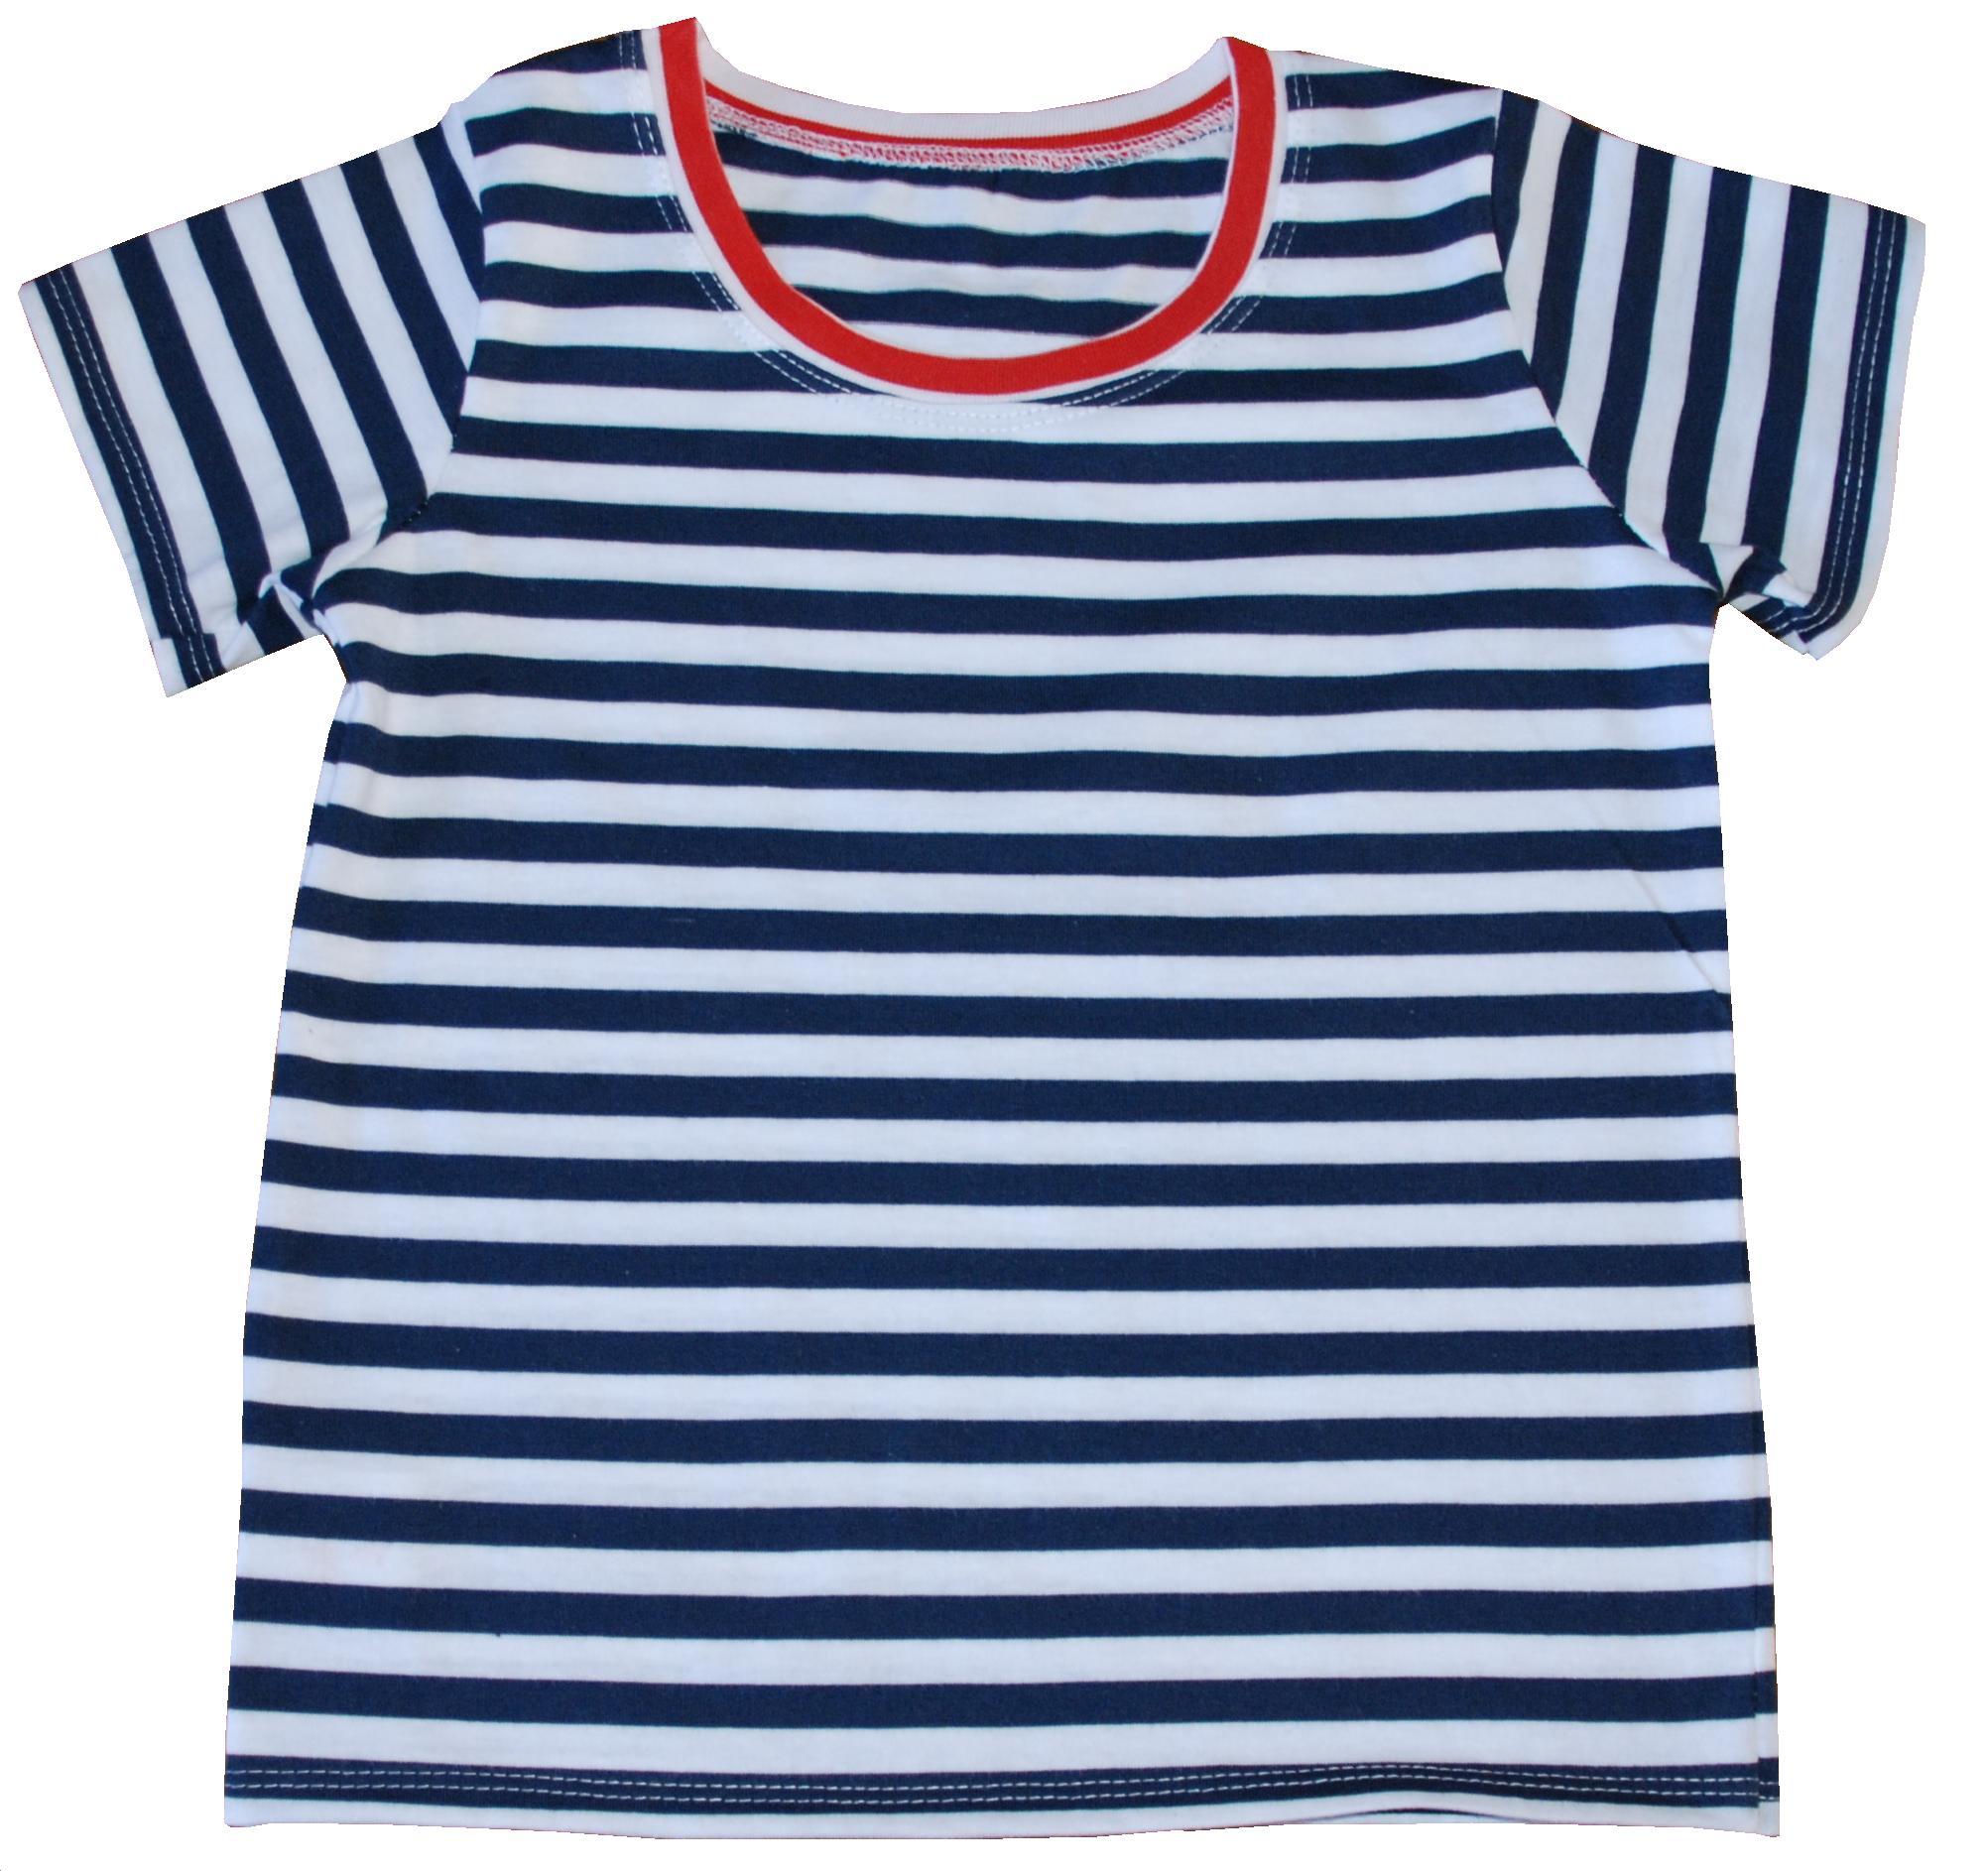 eee142fdecd Námořnické tričko L